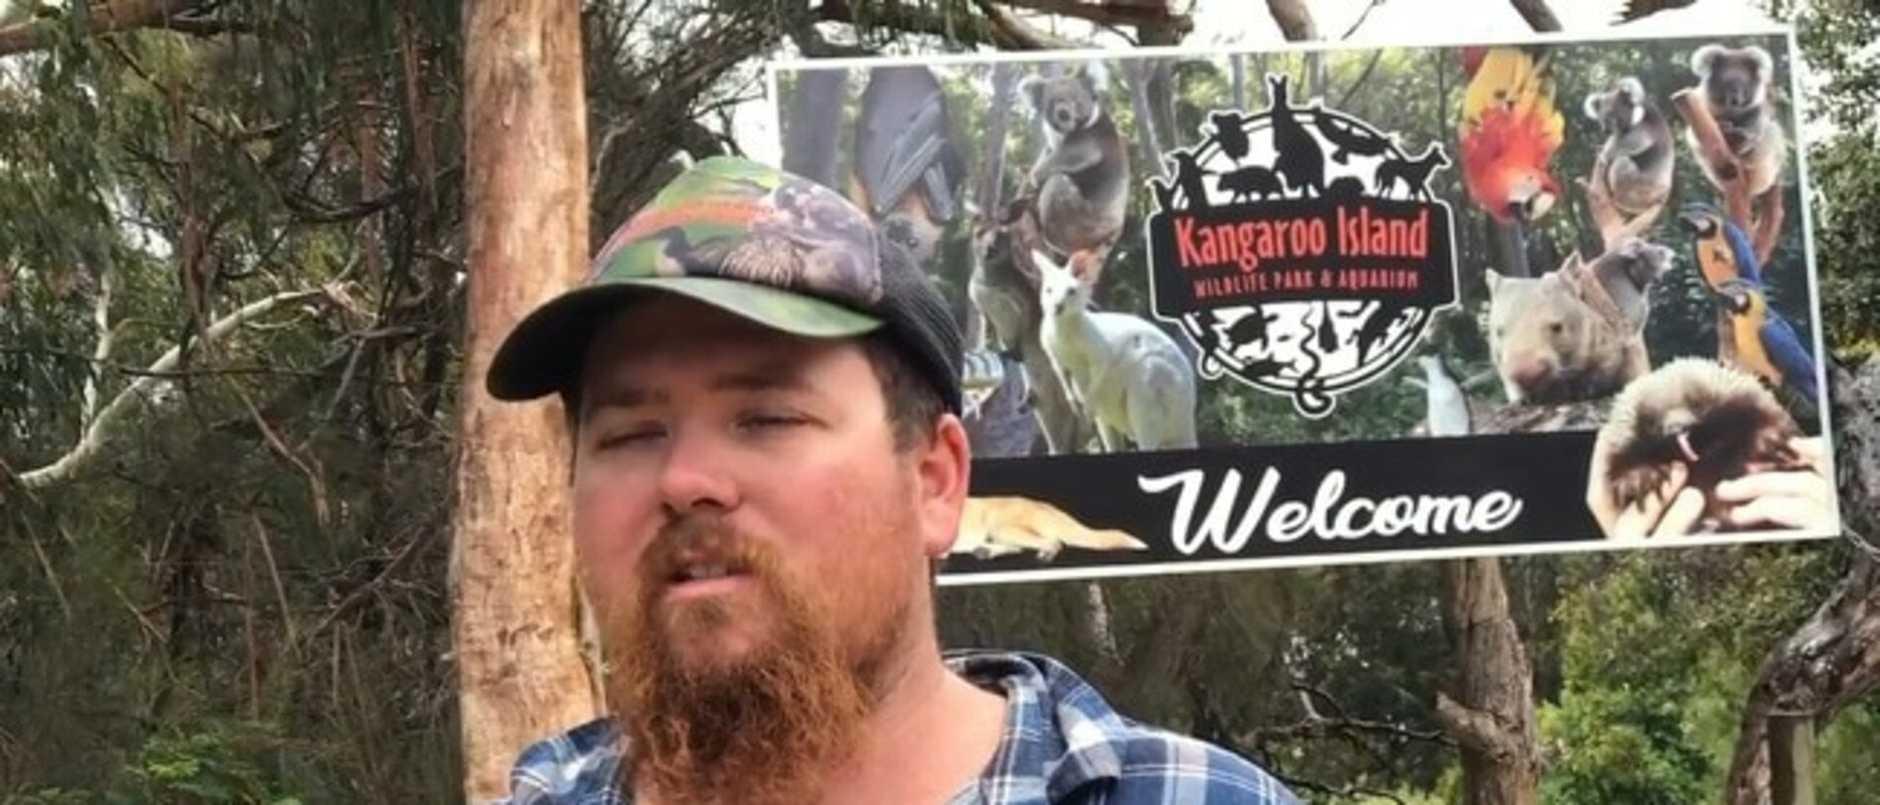 Sam Mitchell, the owner of the Kangaroo Island Wildlife Park